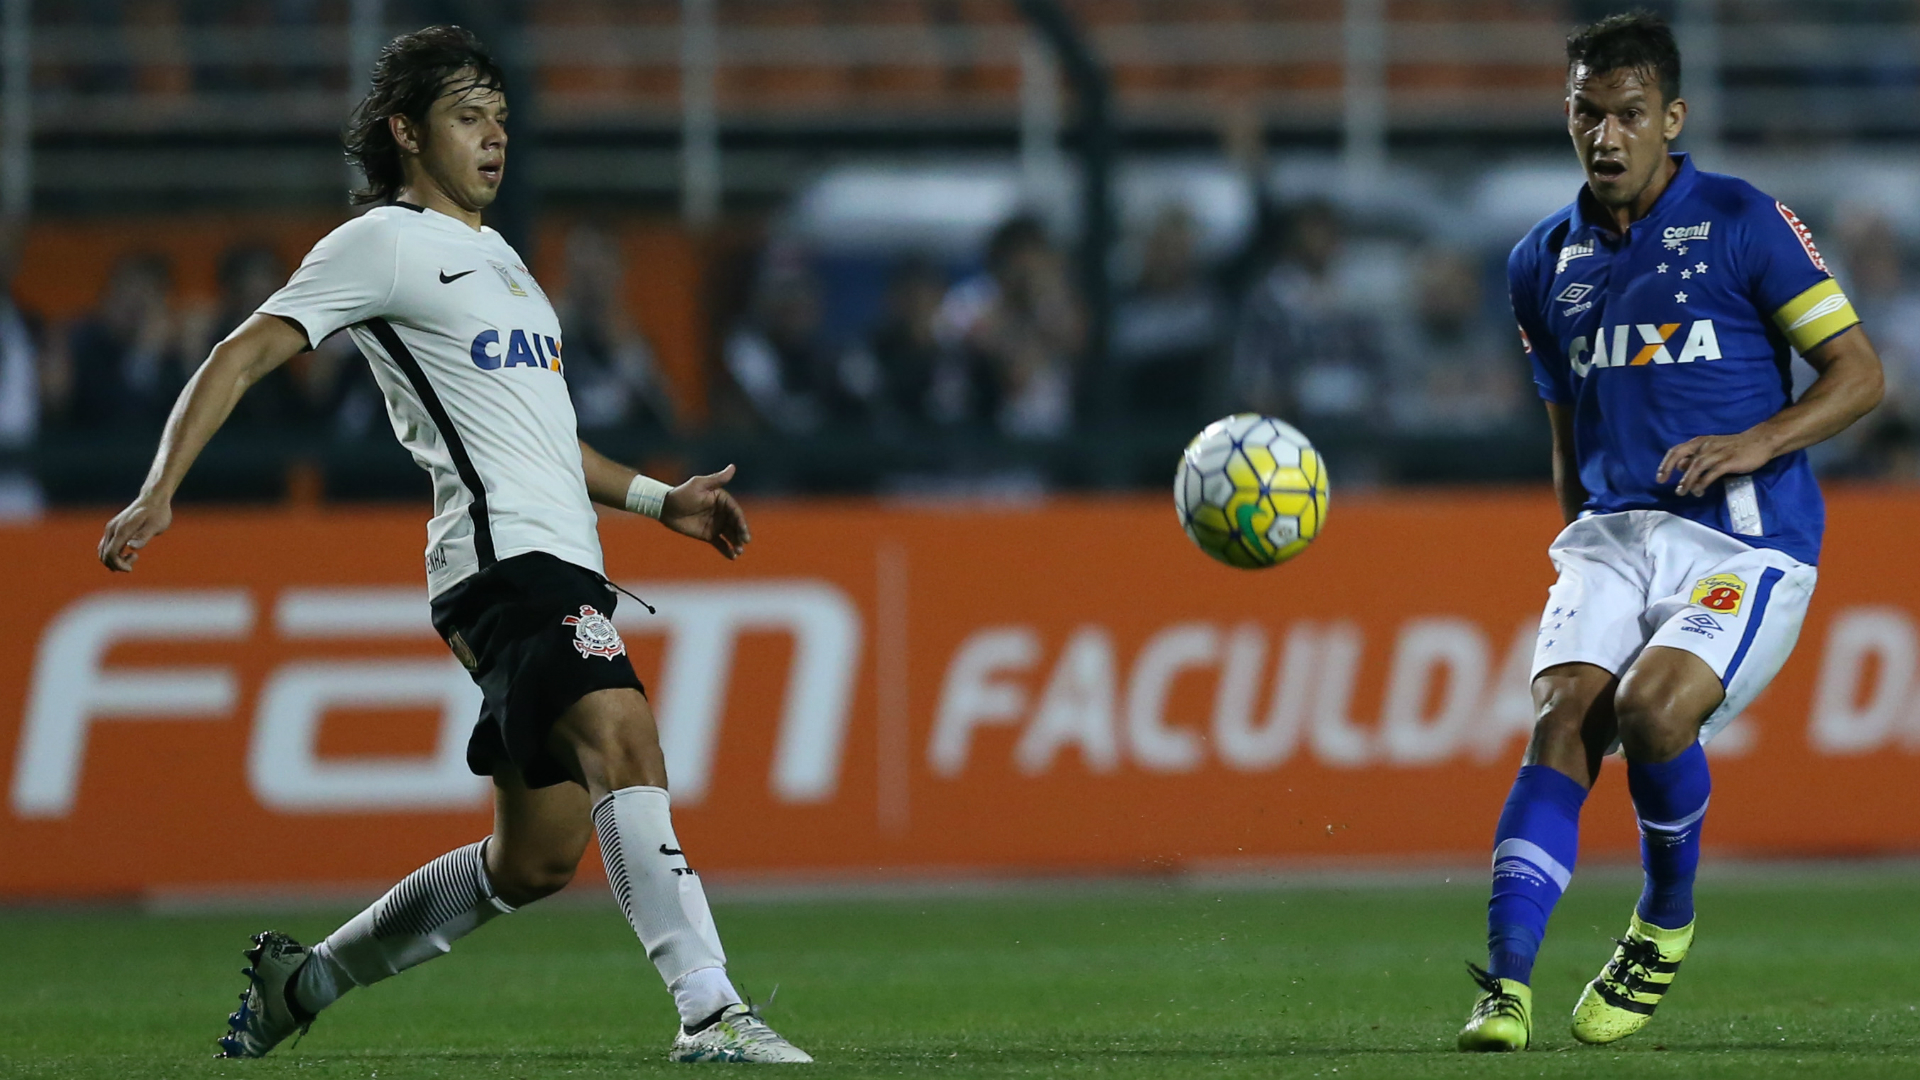 Gremio X Palmeiras Corinthians X Cruzeiro Atletico Mg X Juventude Santos X Internacional As Quartas De Final De Campeoes Da Copa Do Brasil Goal Com